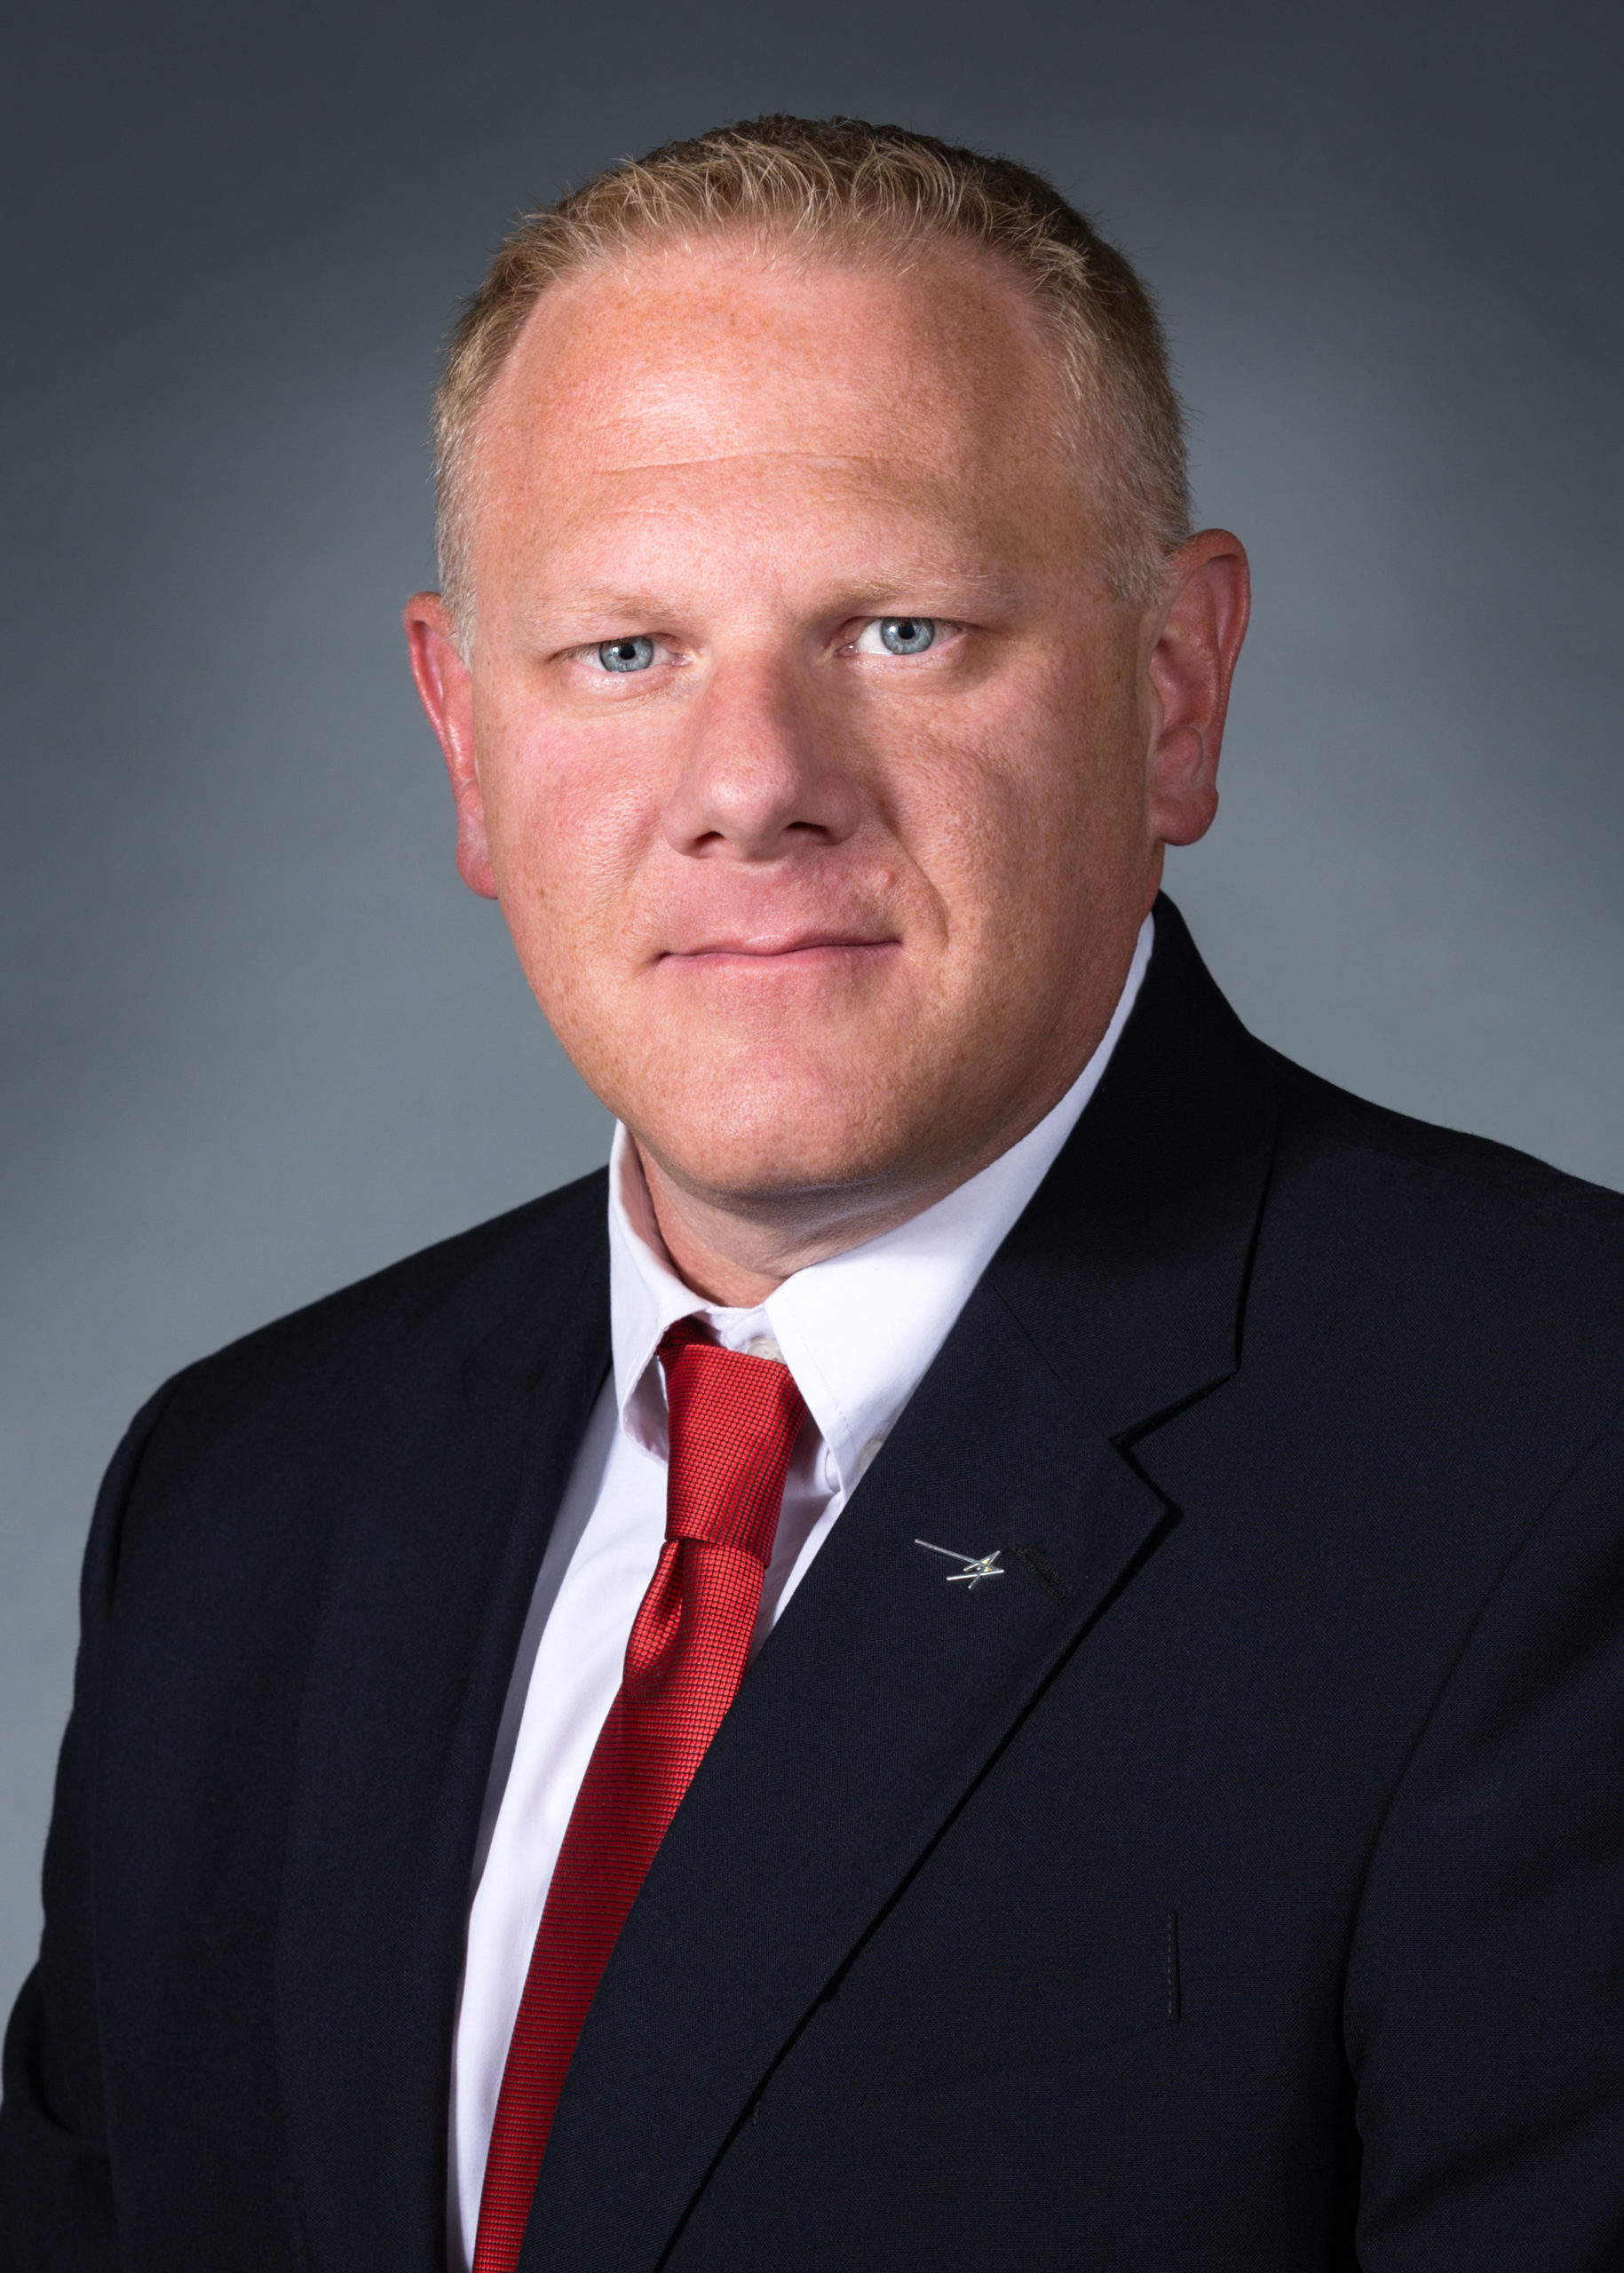 Portrait of Corey Brooker